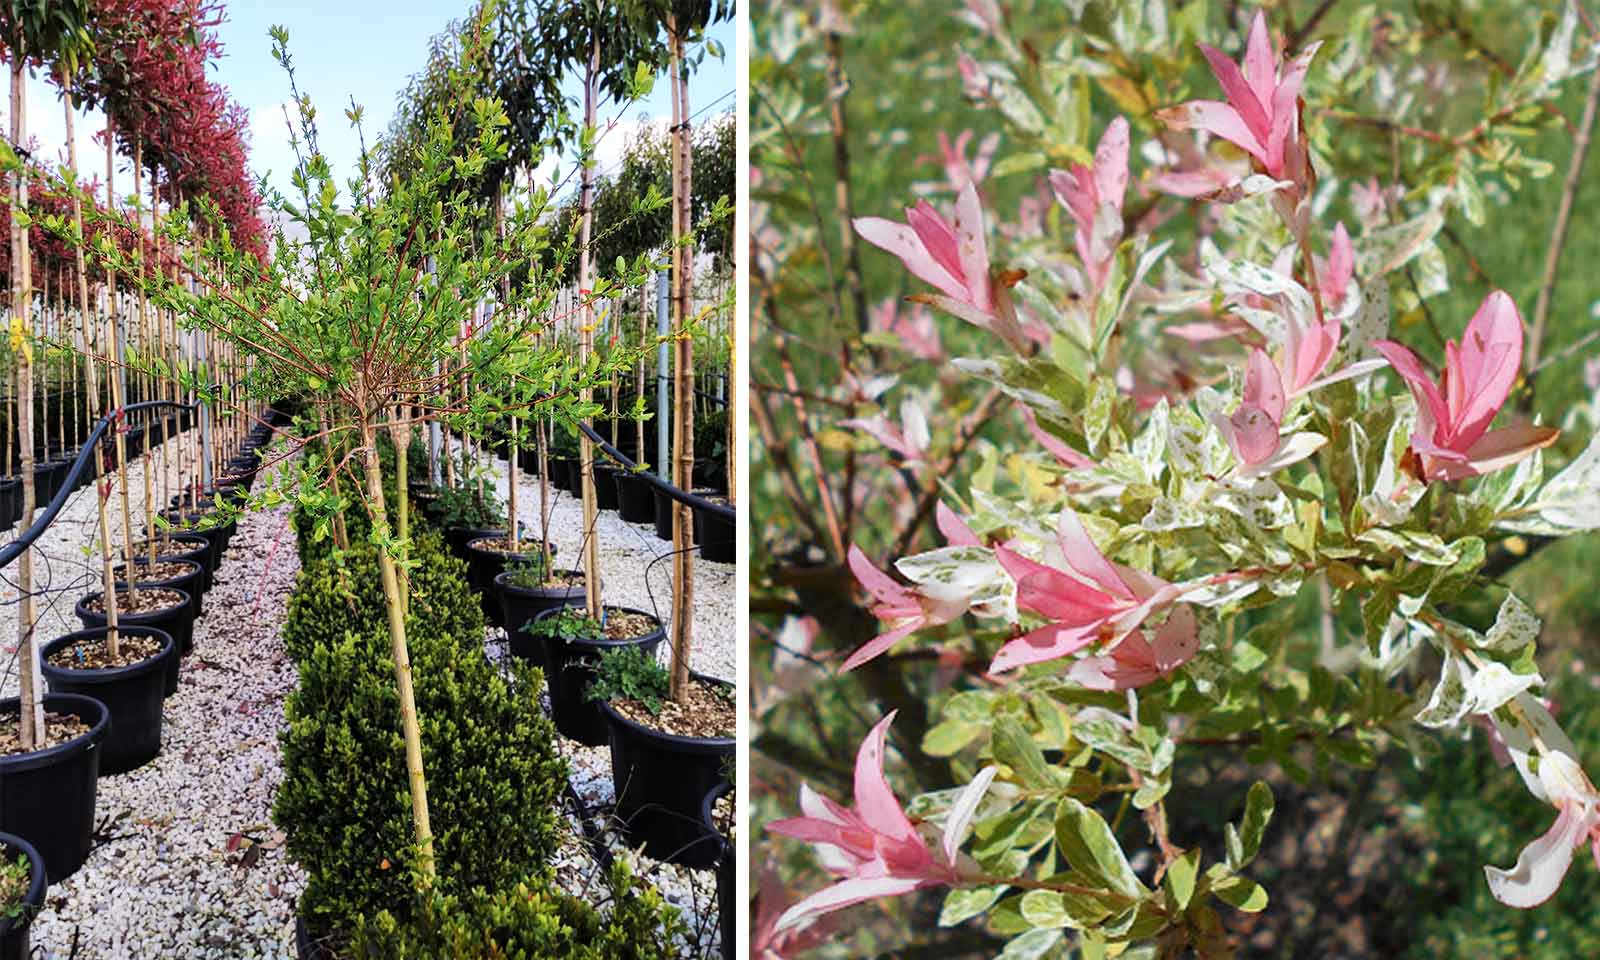 Salix Integra 'Hakuro-Nishiki' (Flamingo Willow / Shrimp Willow) - Half Standard